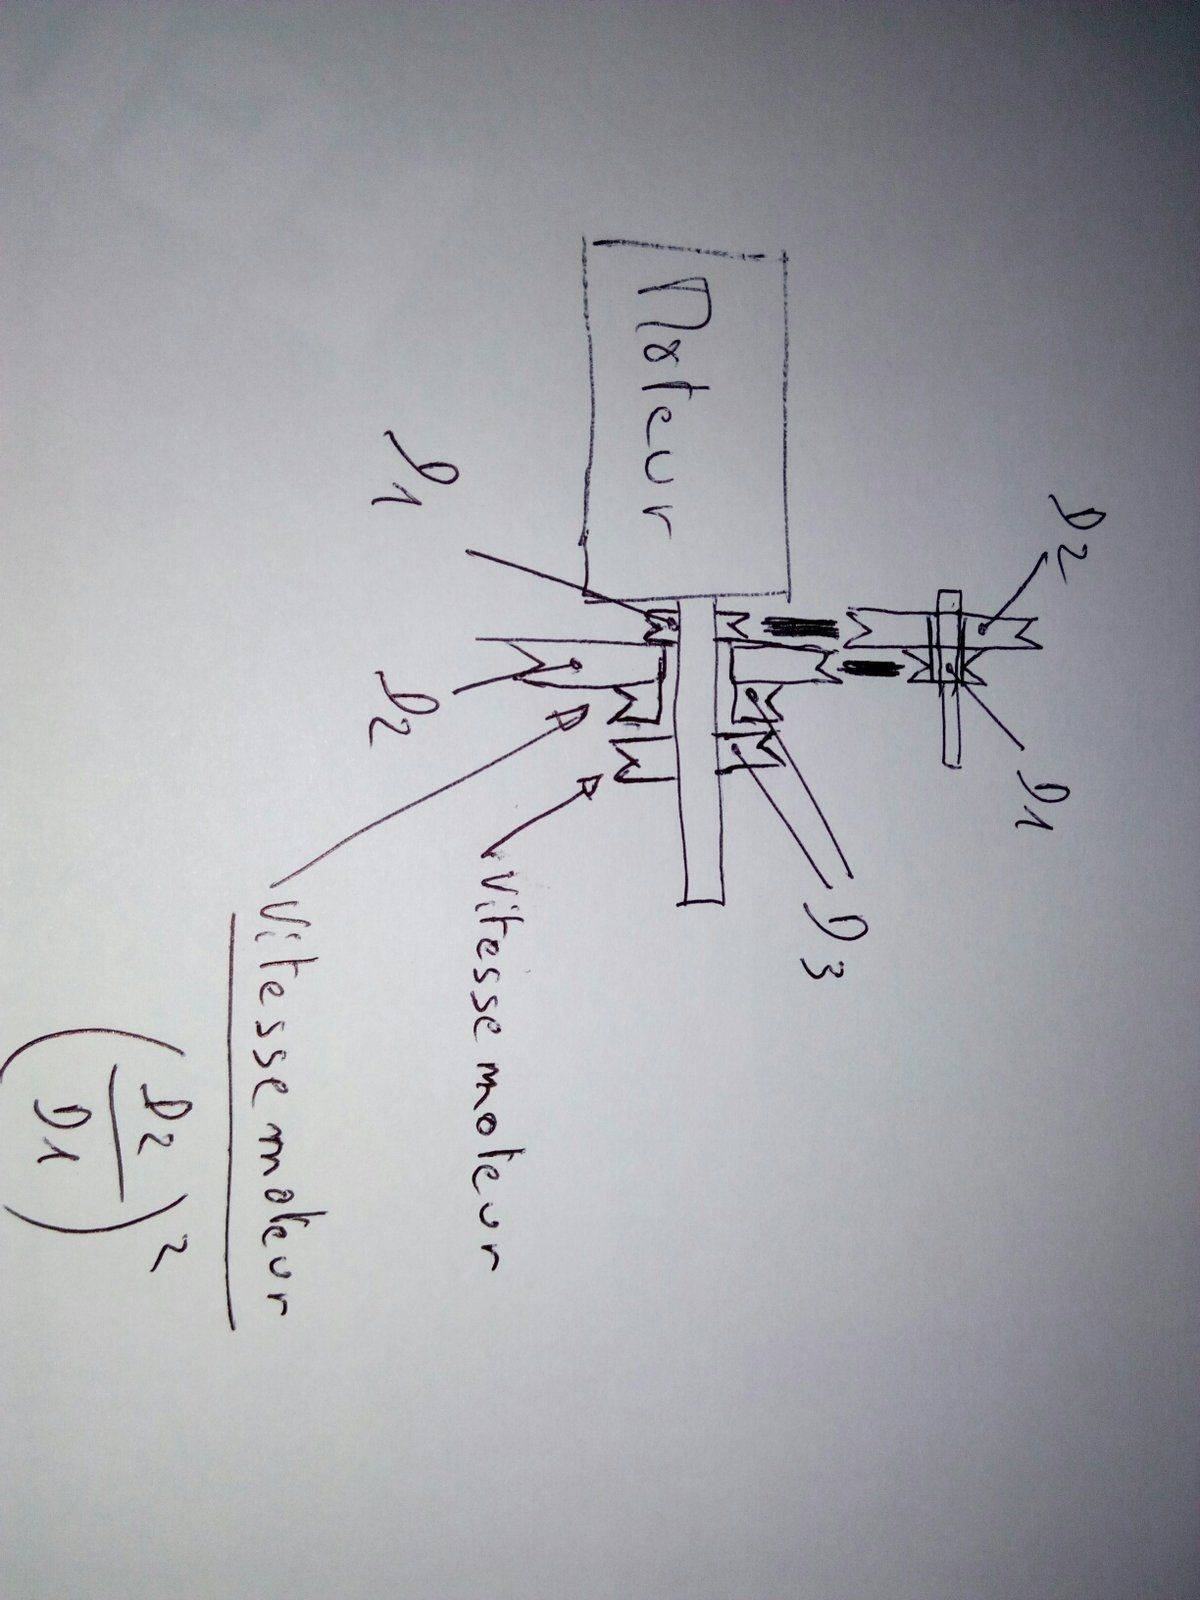 tmp-cam-678739115.jpg